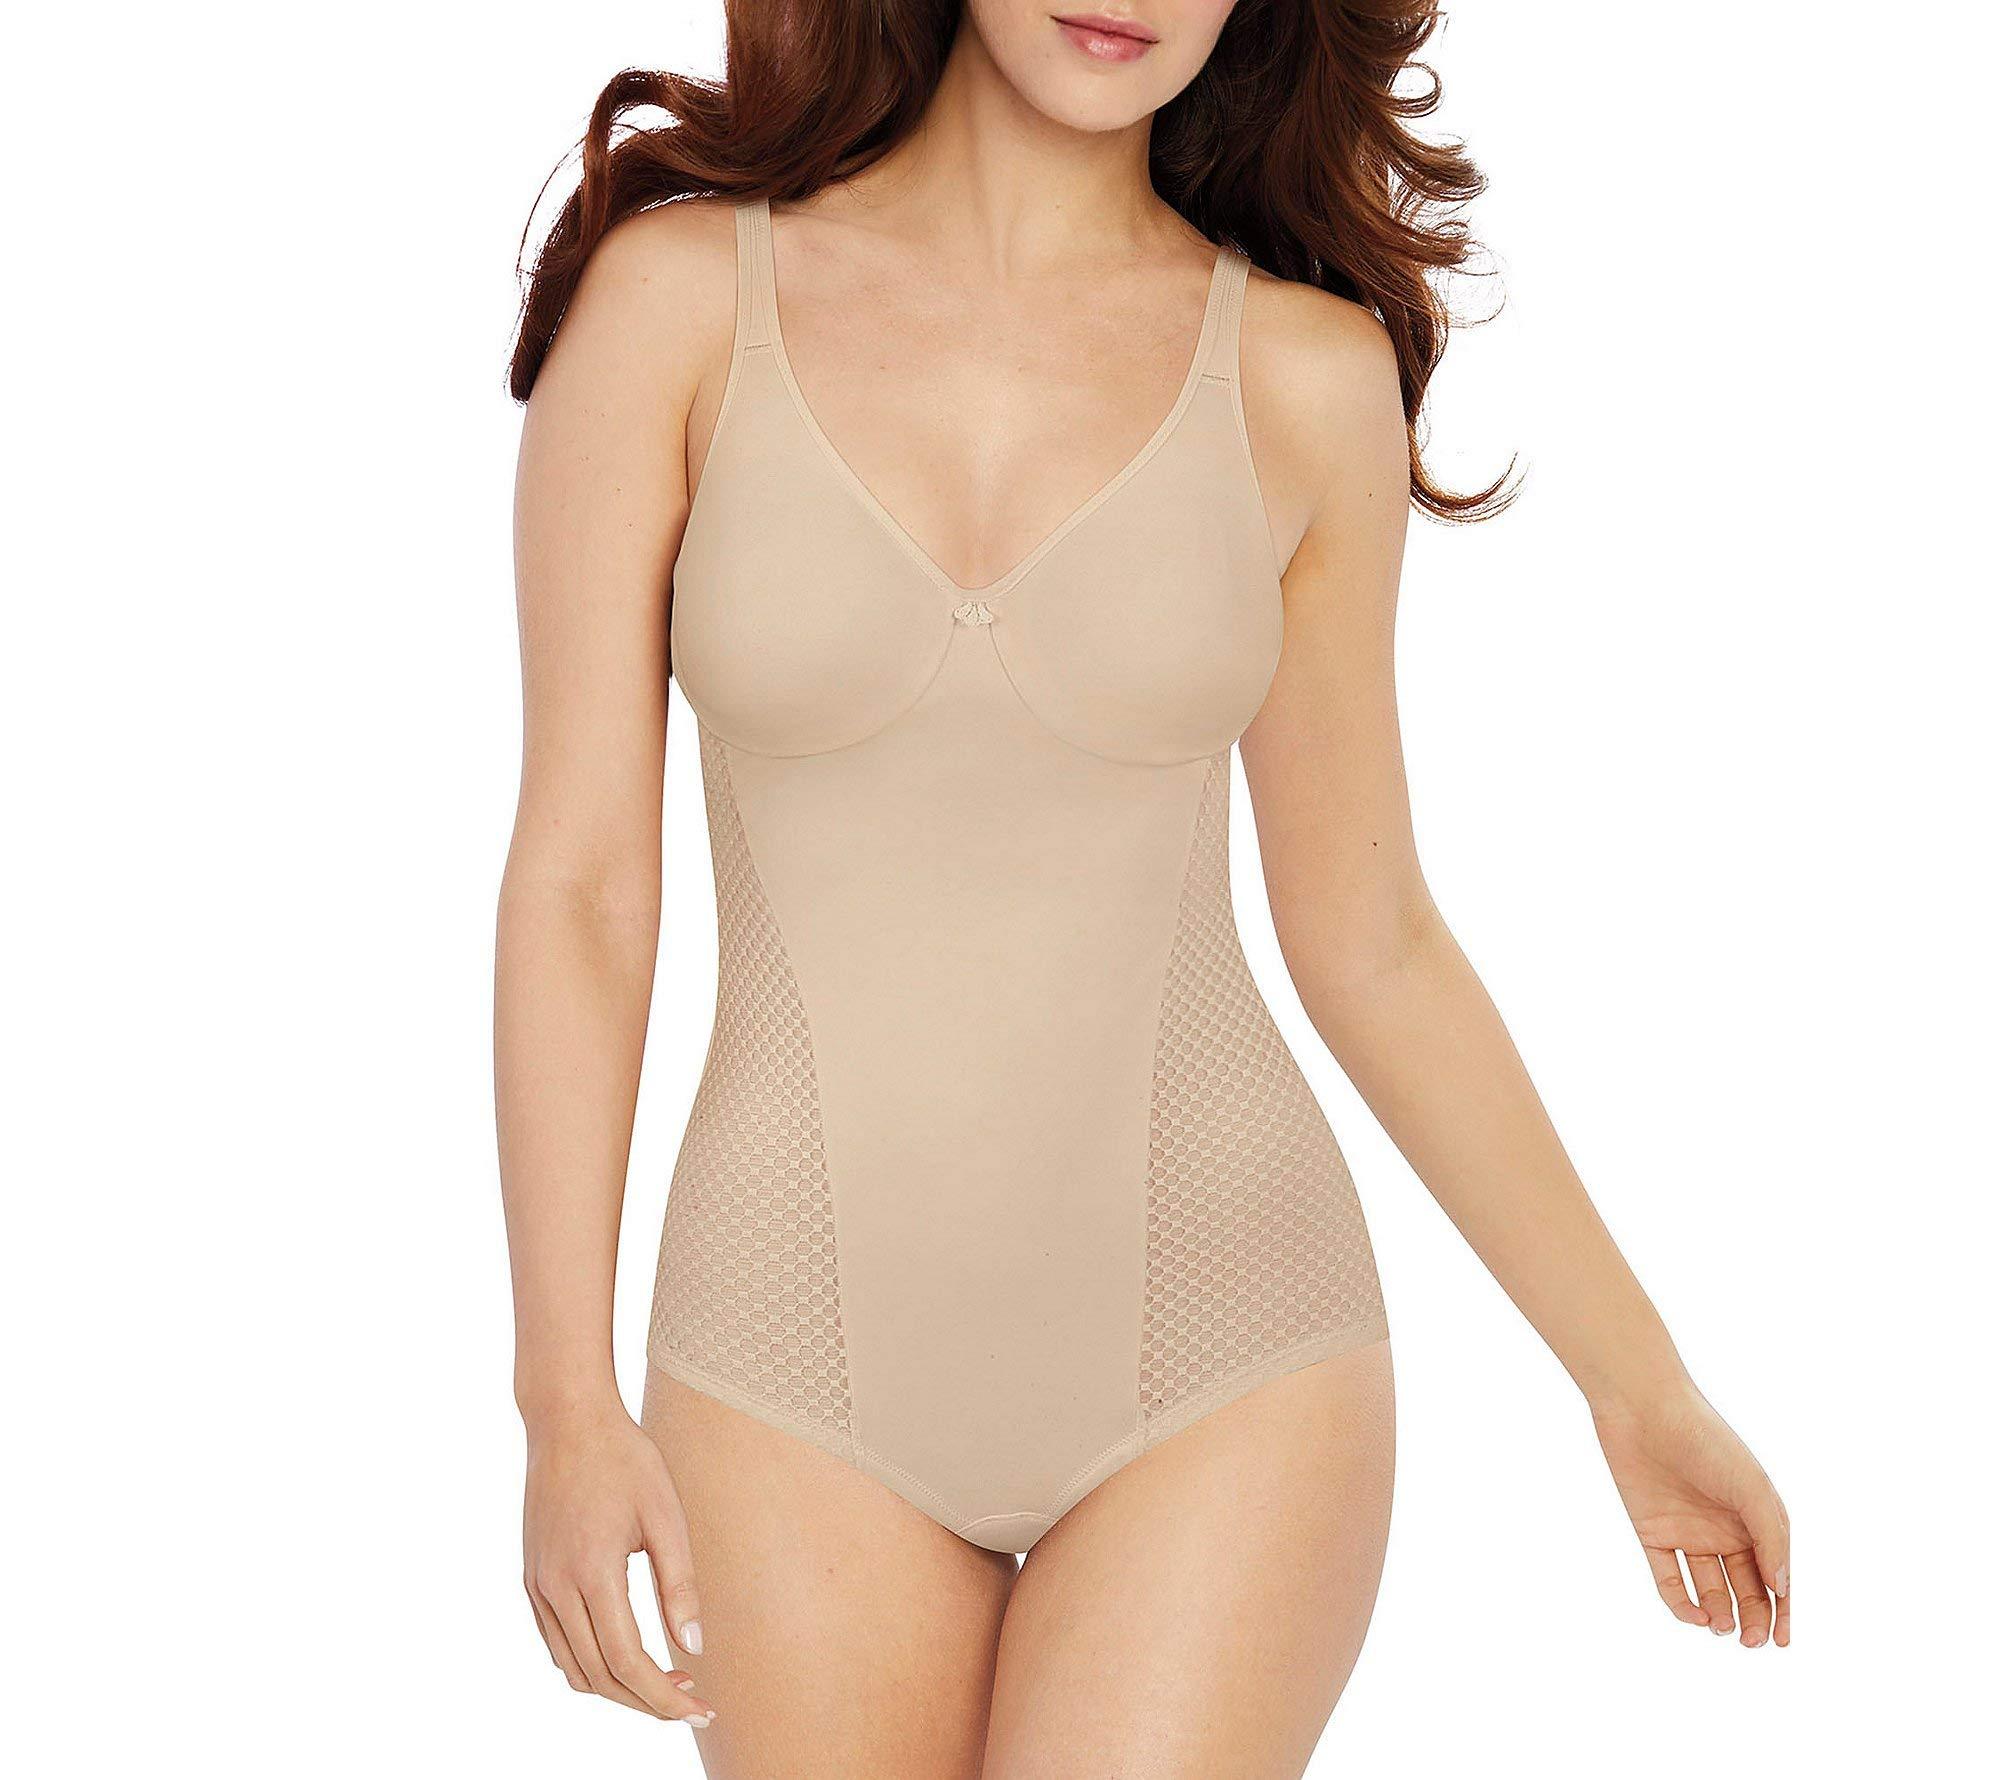 Bali Passion Comfort Minimizer Bodysuit